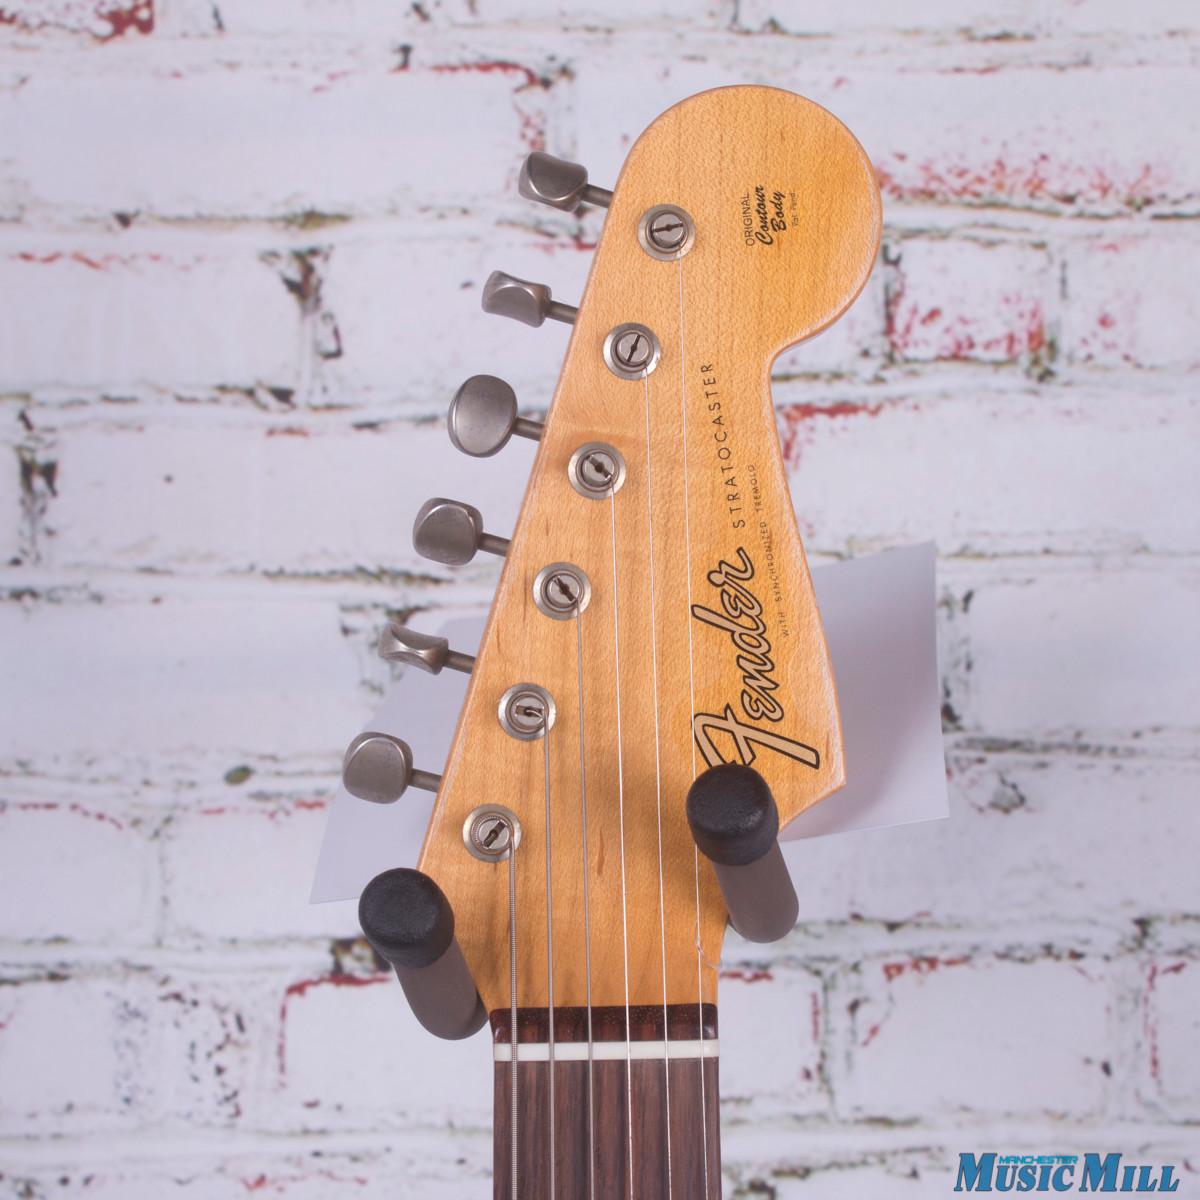 Fender Custom Shop Postmodern Stratocaster Journeyman Relic Daphne Blue